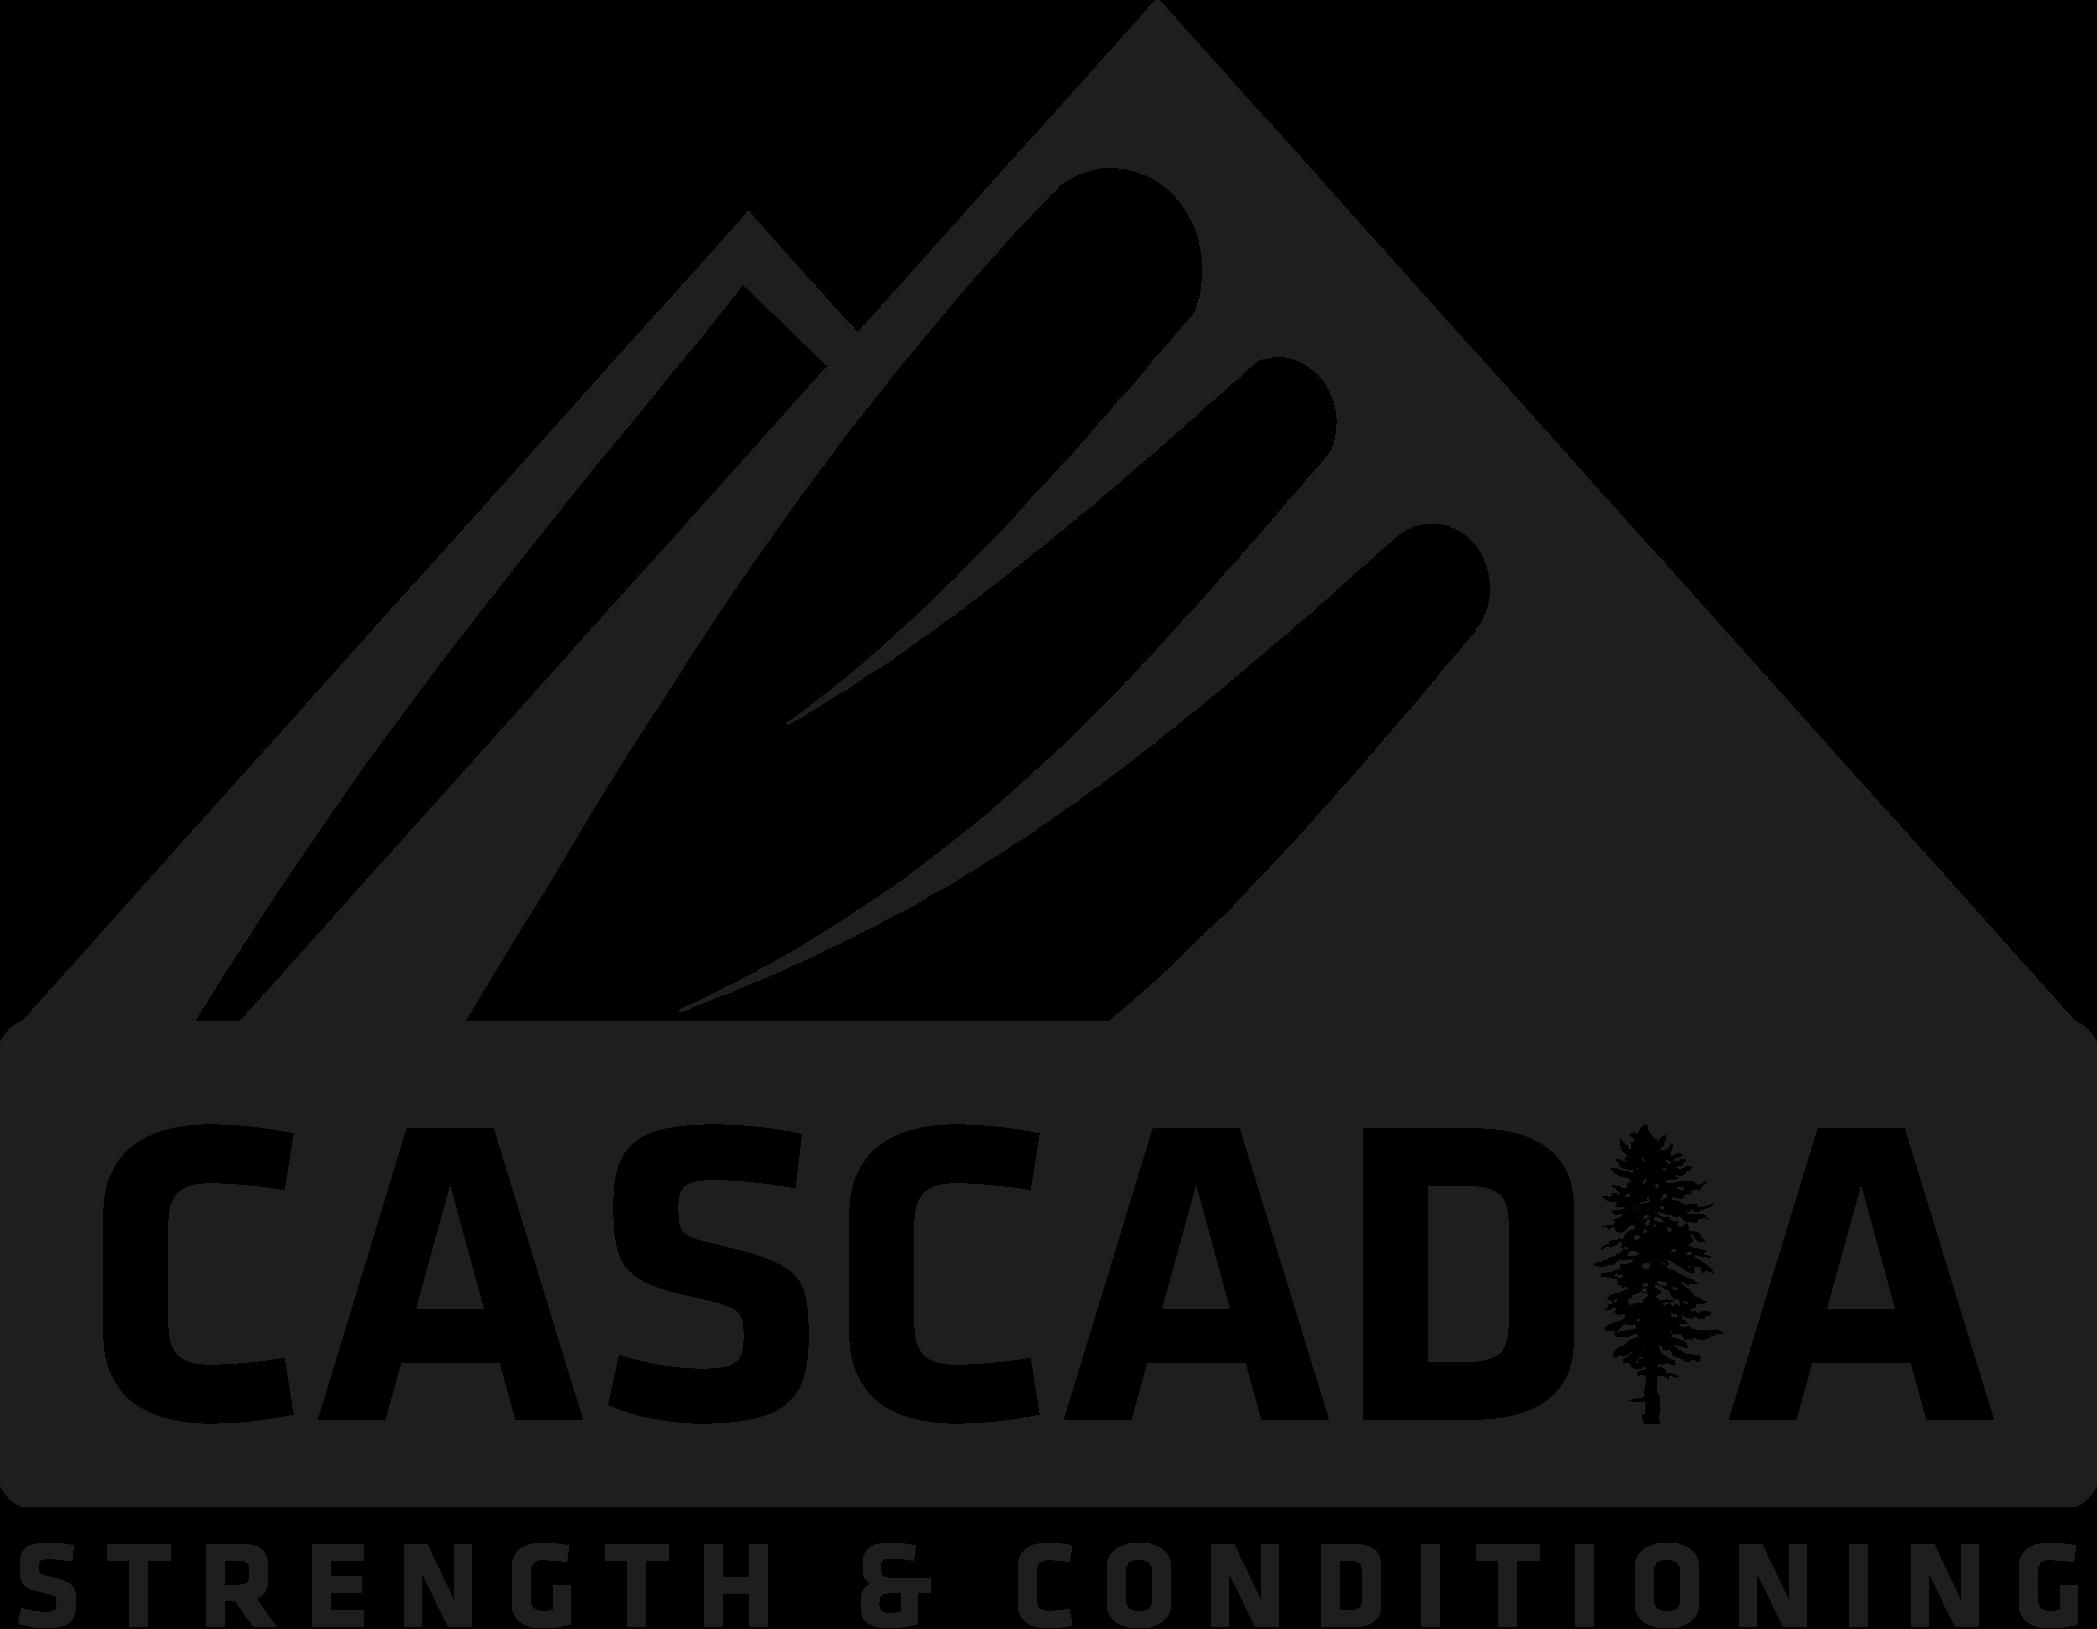 CascadiaLogosmall.png